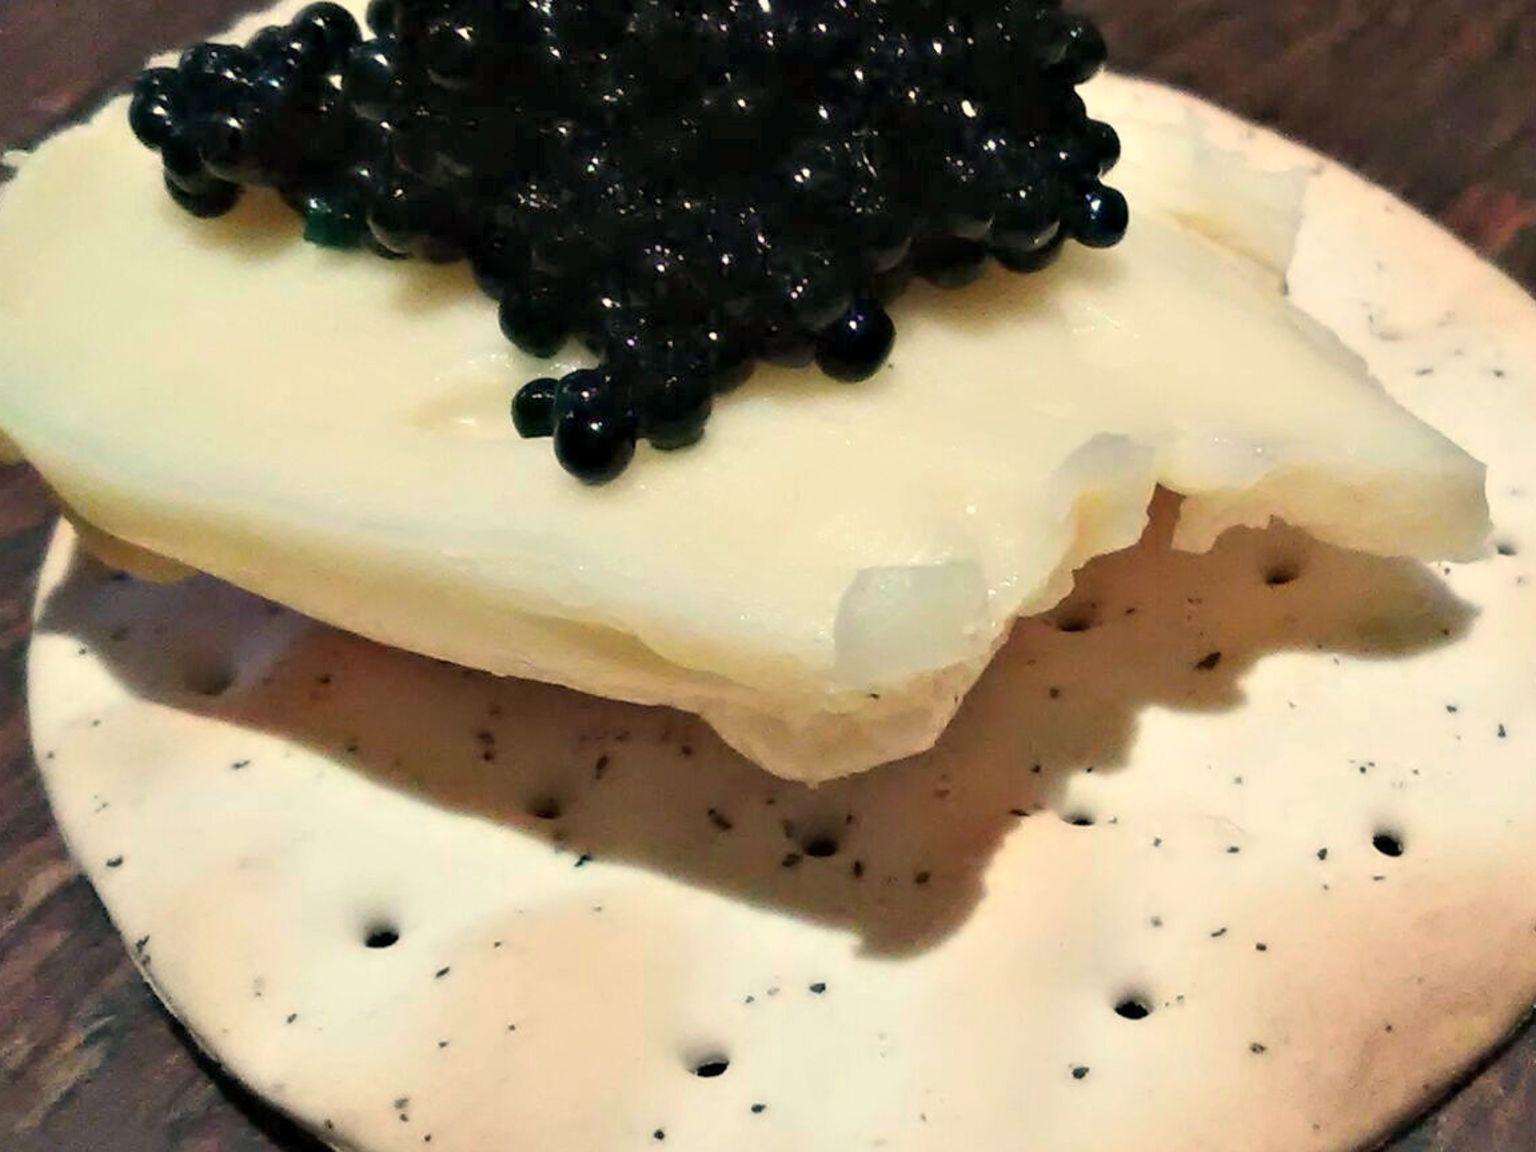 Caviar tw9zvs